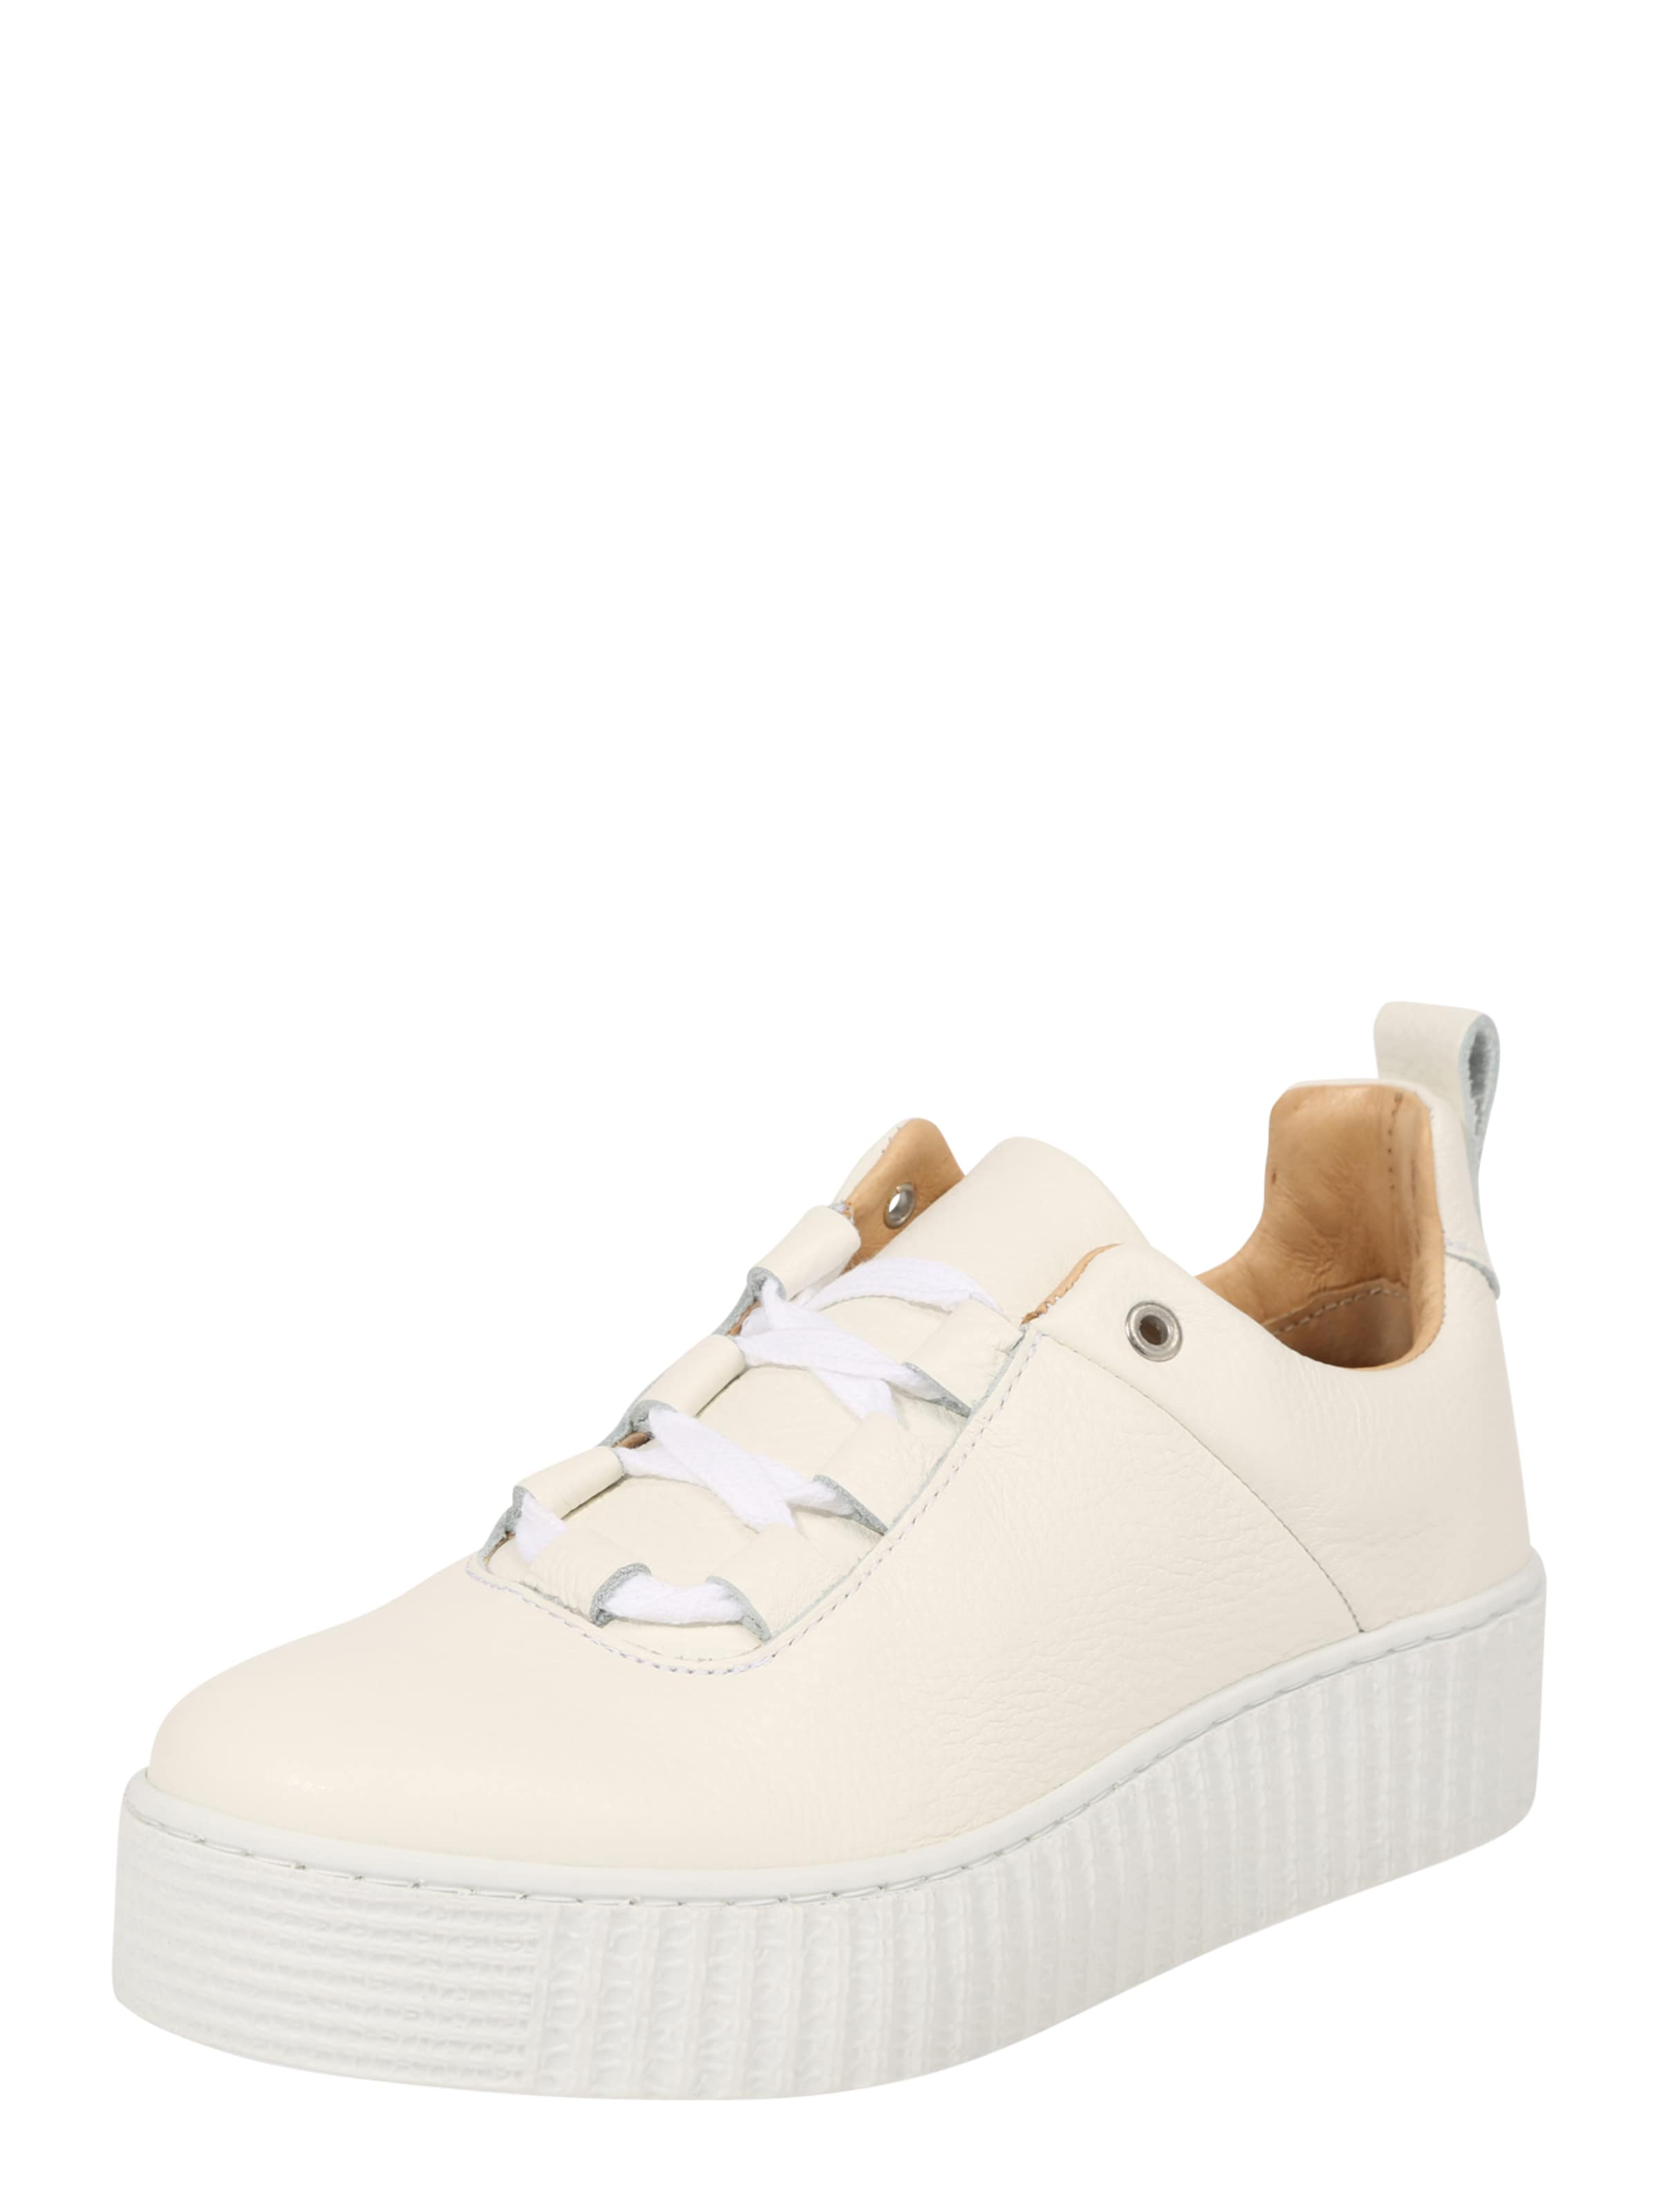 Sneaker Samsoeamp; Samsoeamp; In In Weiß Samsoeamp; Weiß Weiß Samsoeamp; Sneaker Sneaker In fgb7yY6